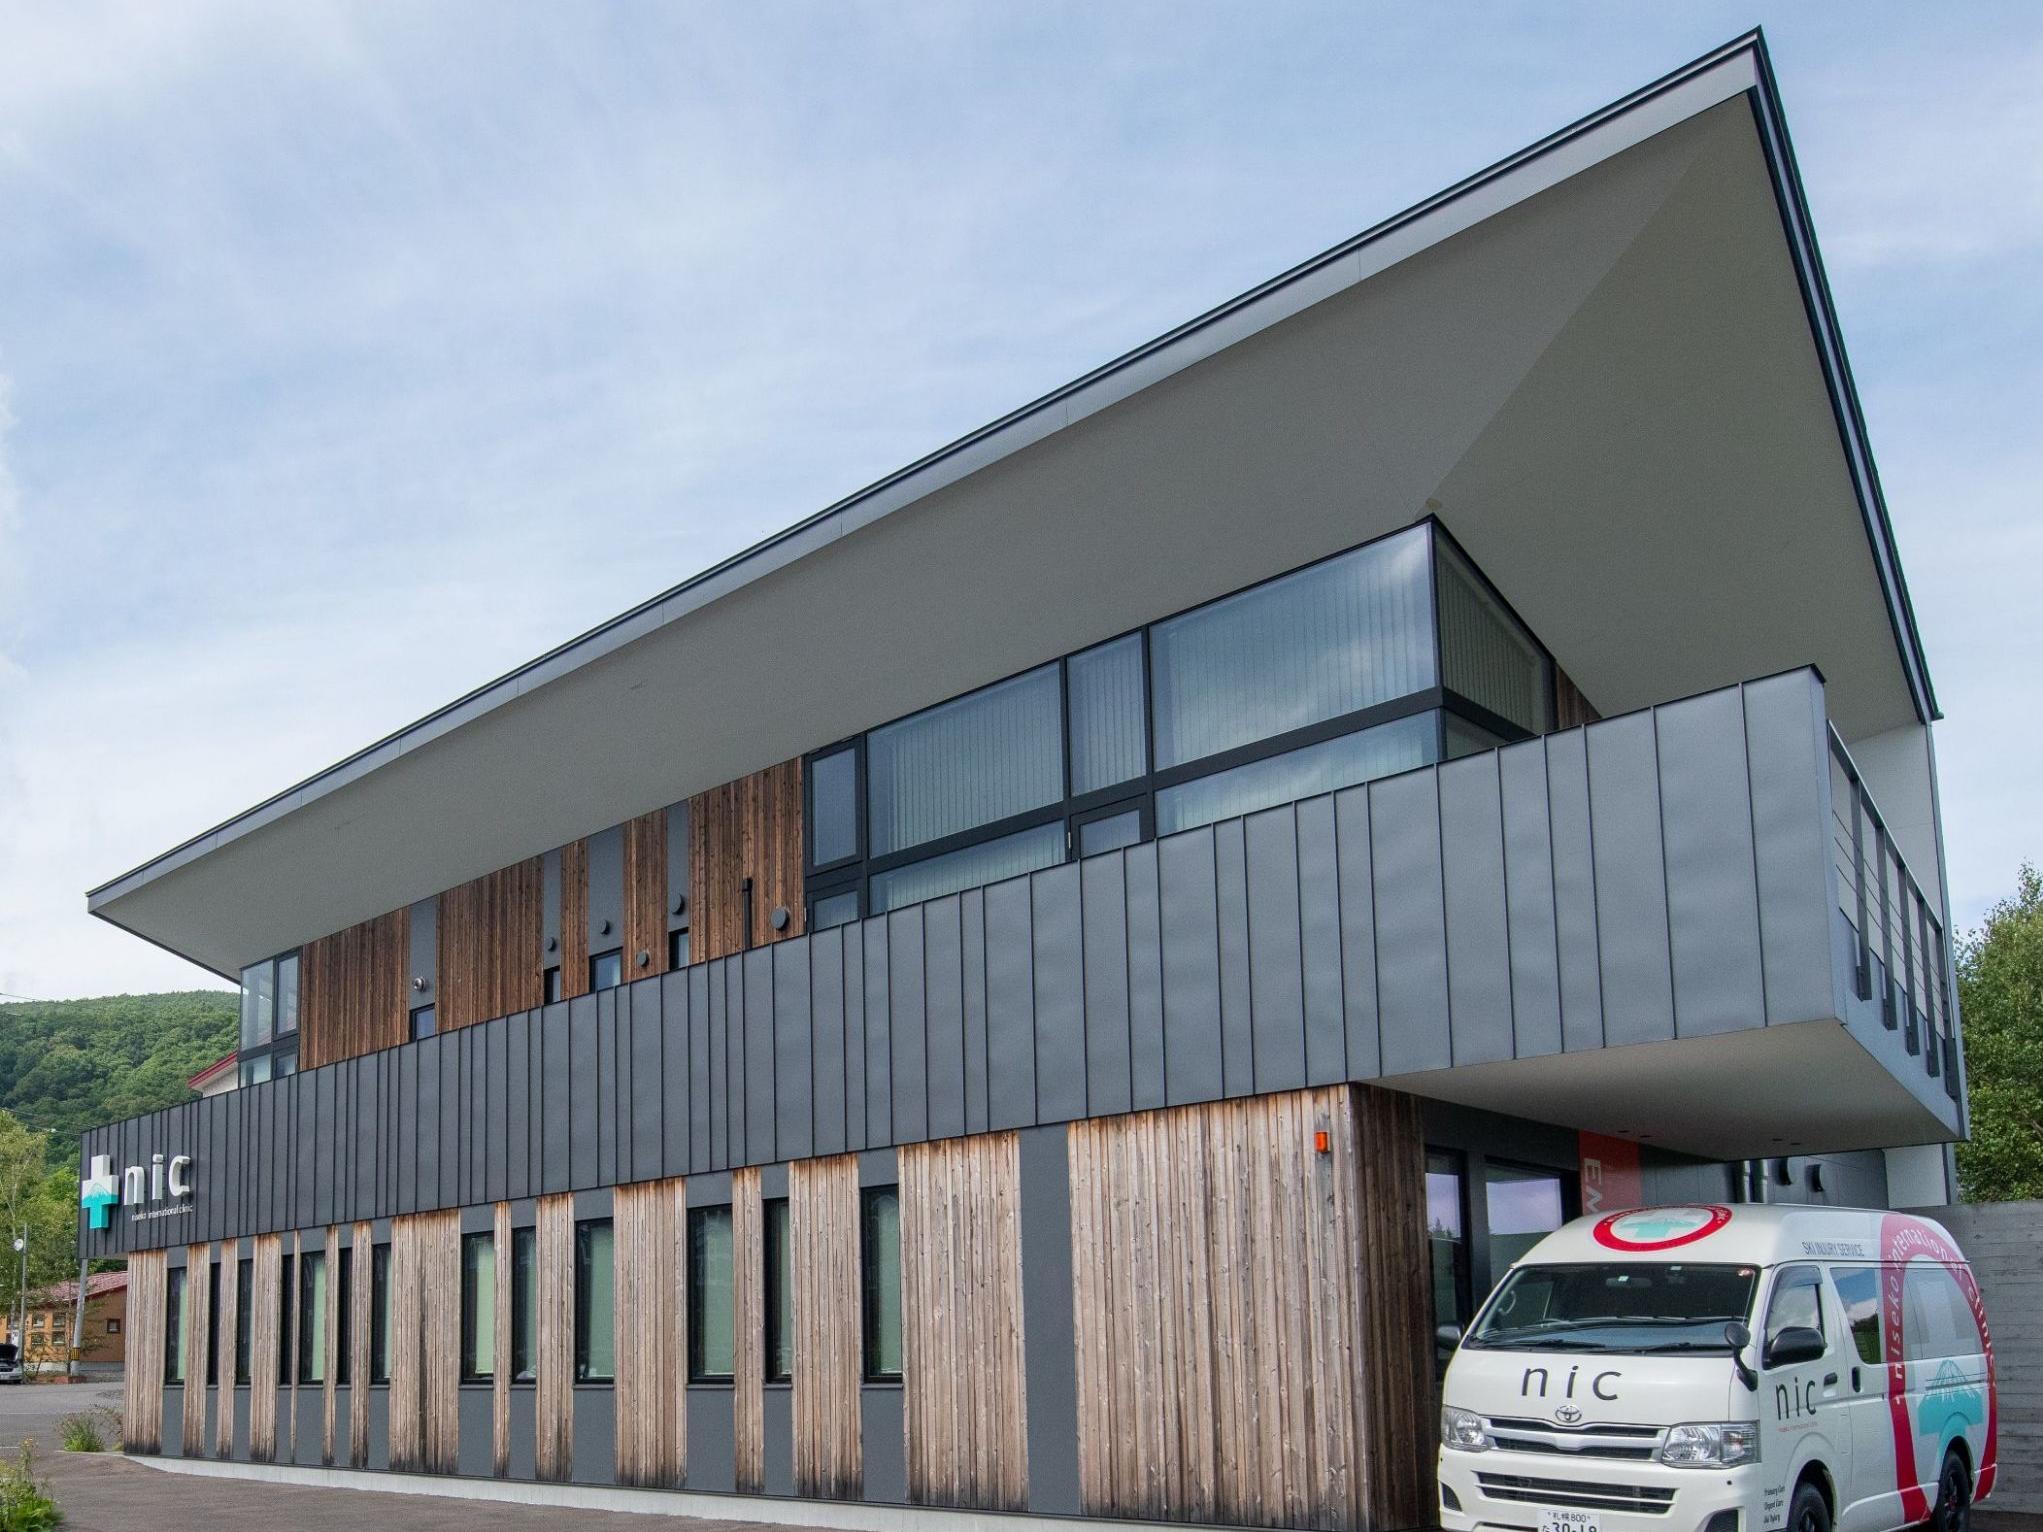 Exterior view of Niseko international clinic near Chatrium Niseko Japan